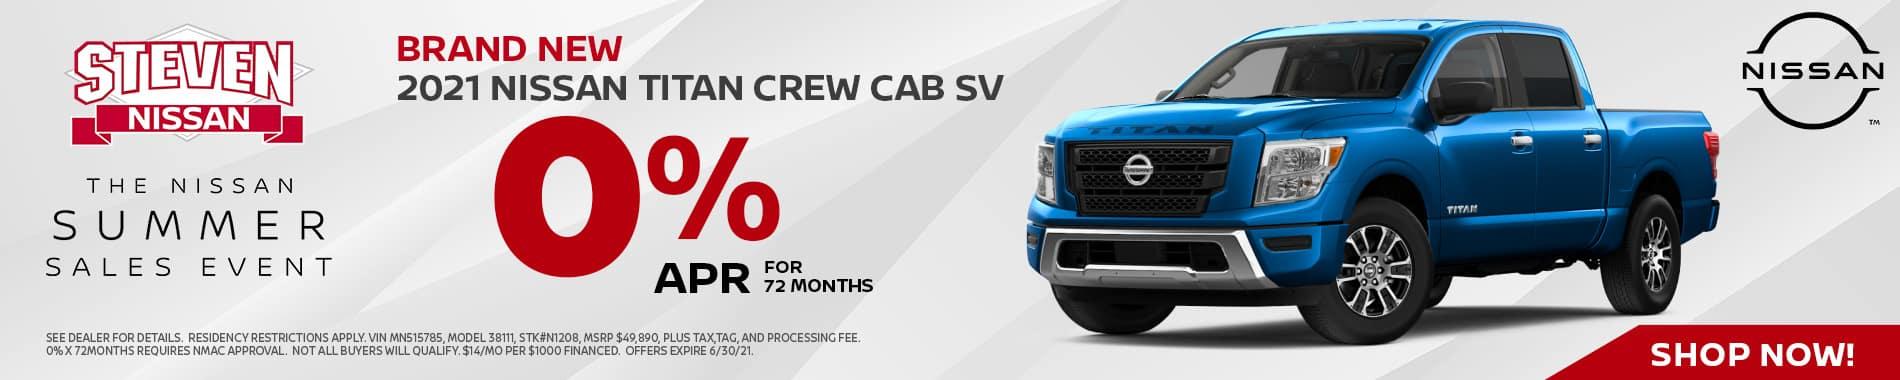 6.21-Steven-Nissan-2021-Nissan-Titan-Crew-Cab-SV